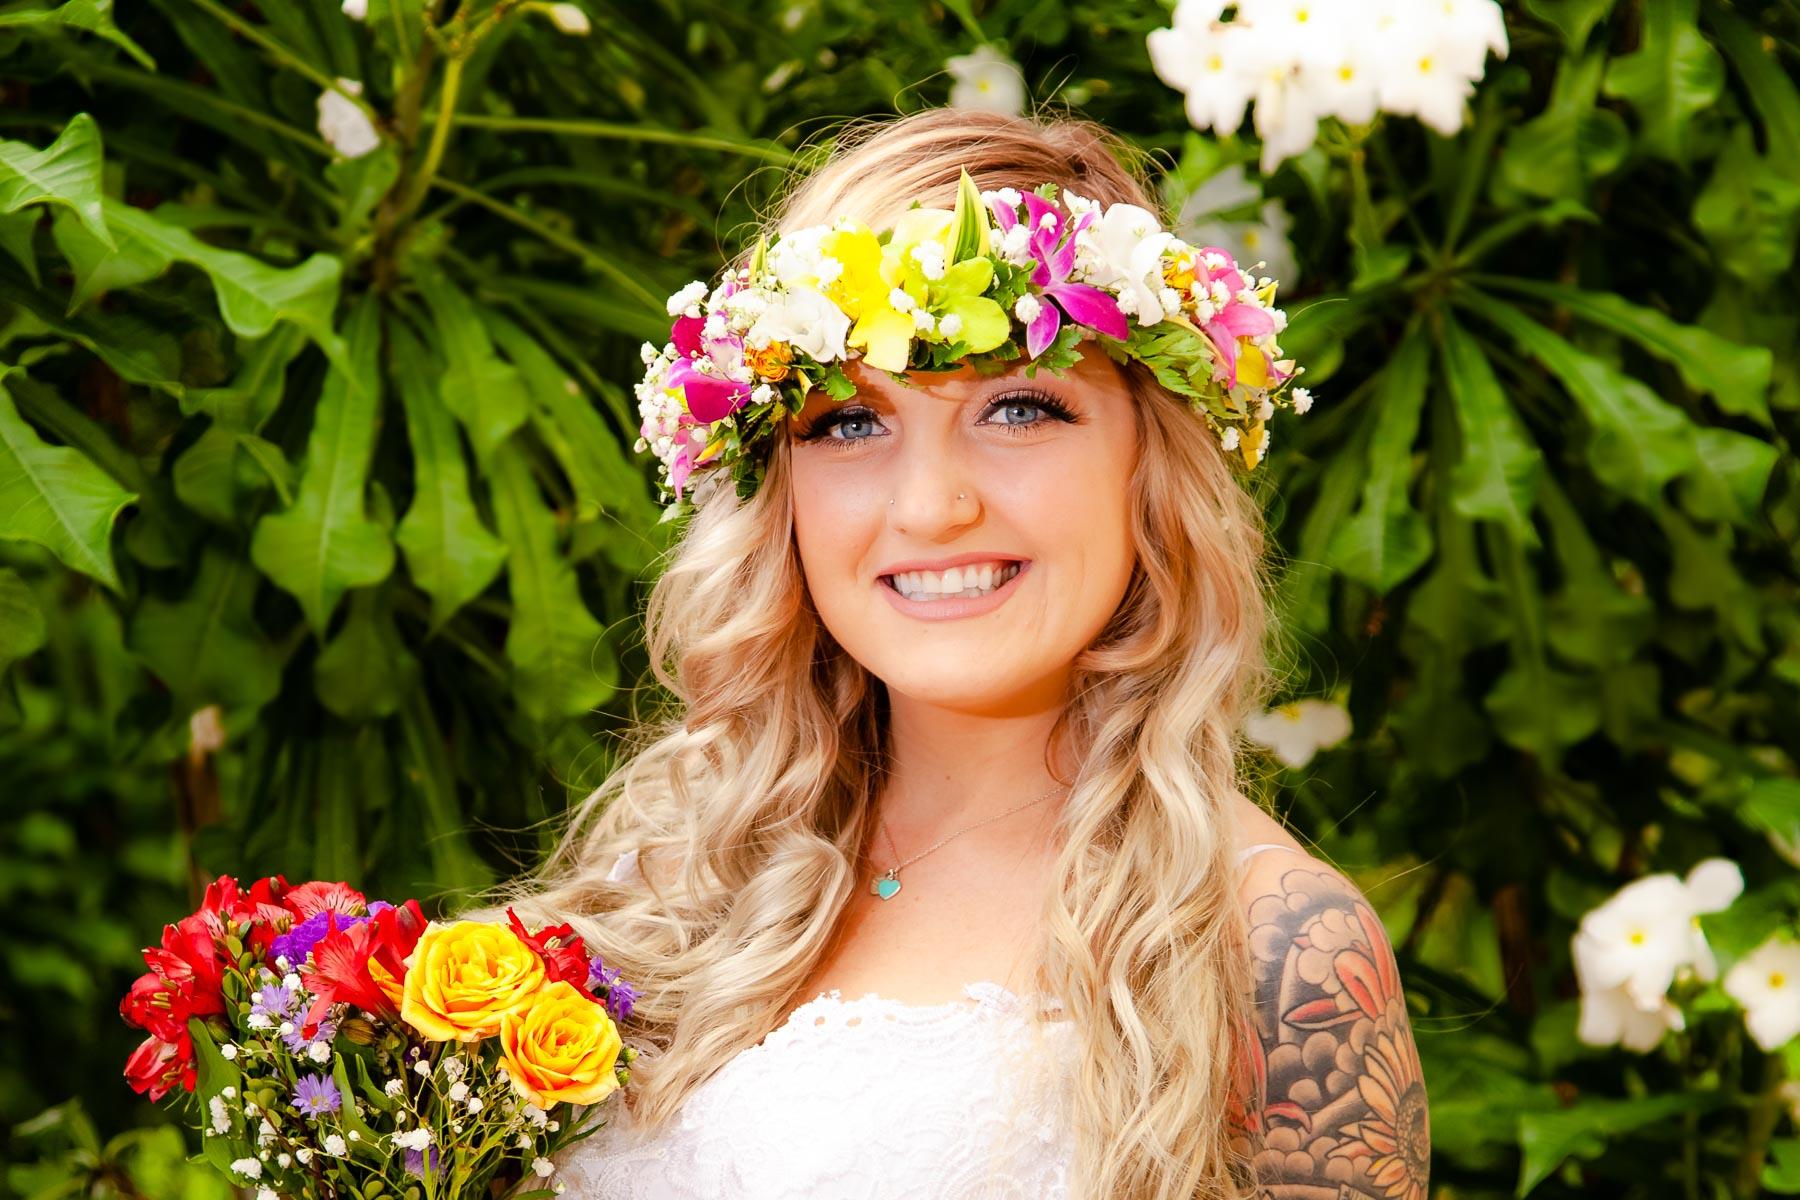 brides garden bridal portrait oahu hawaii